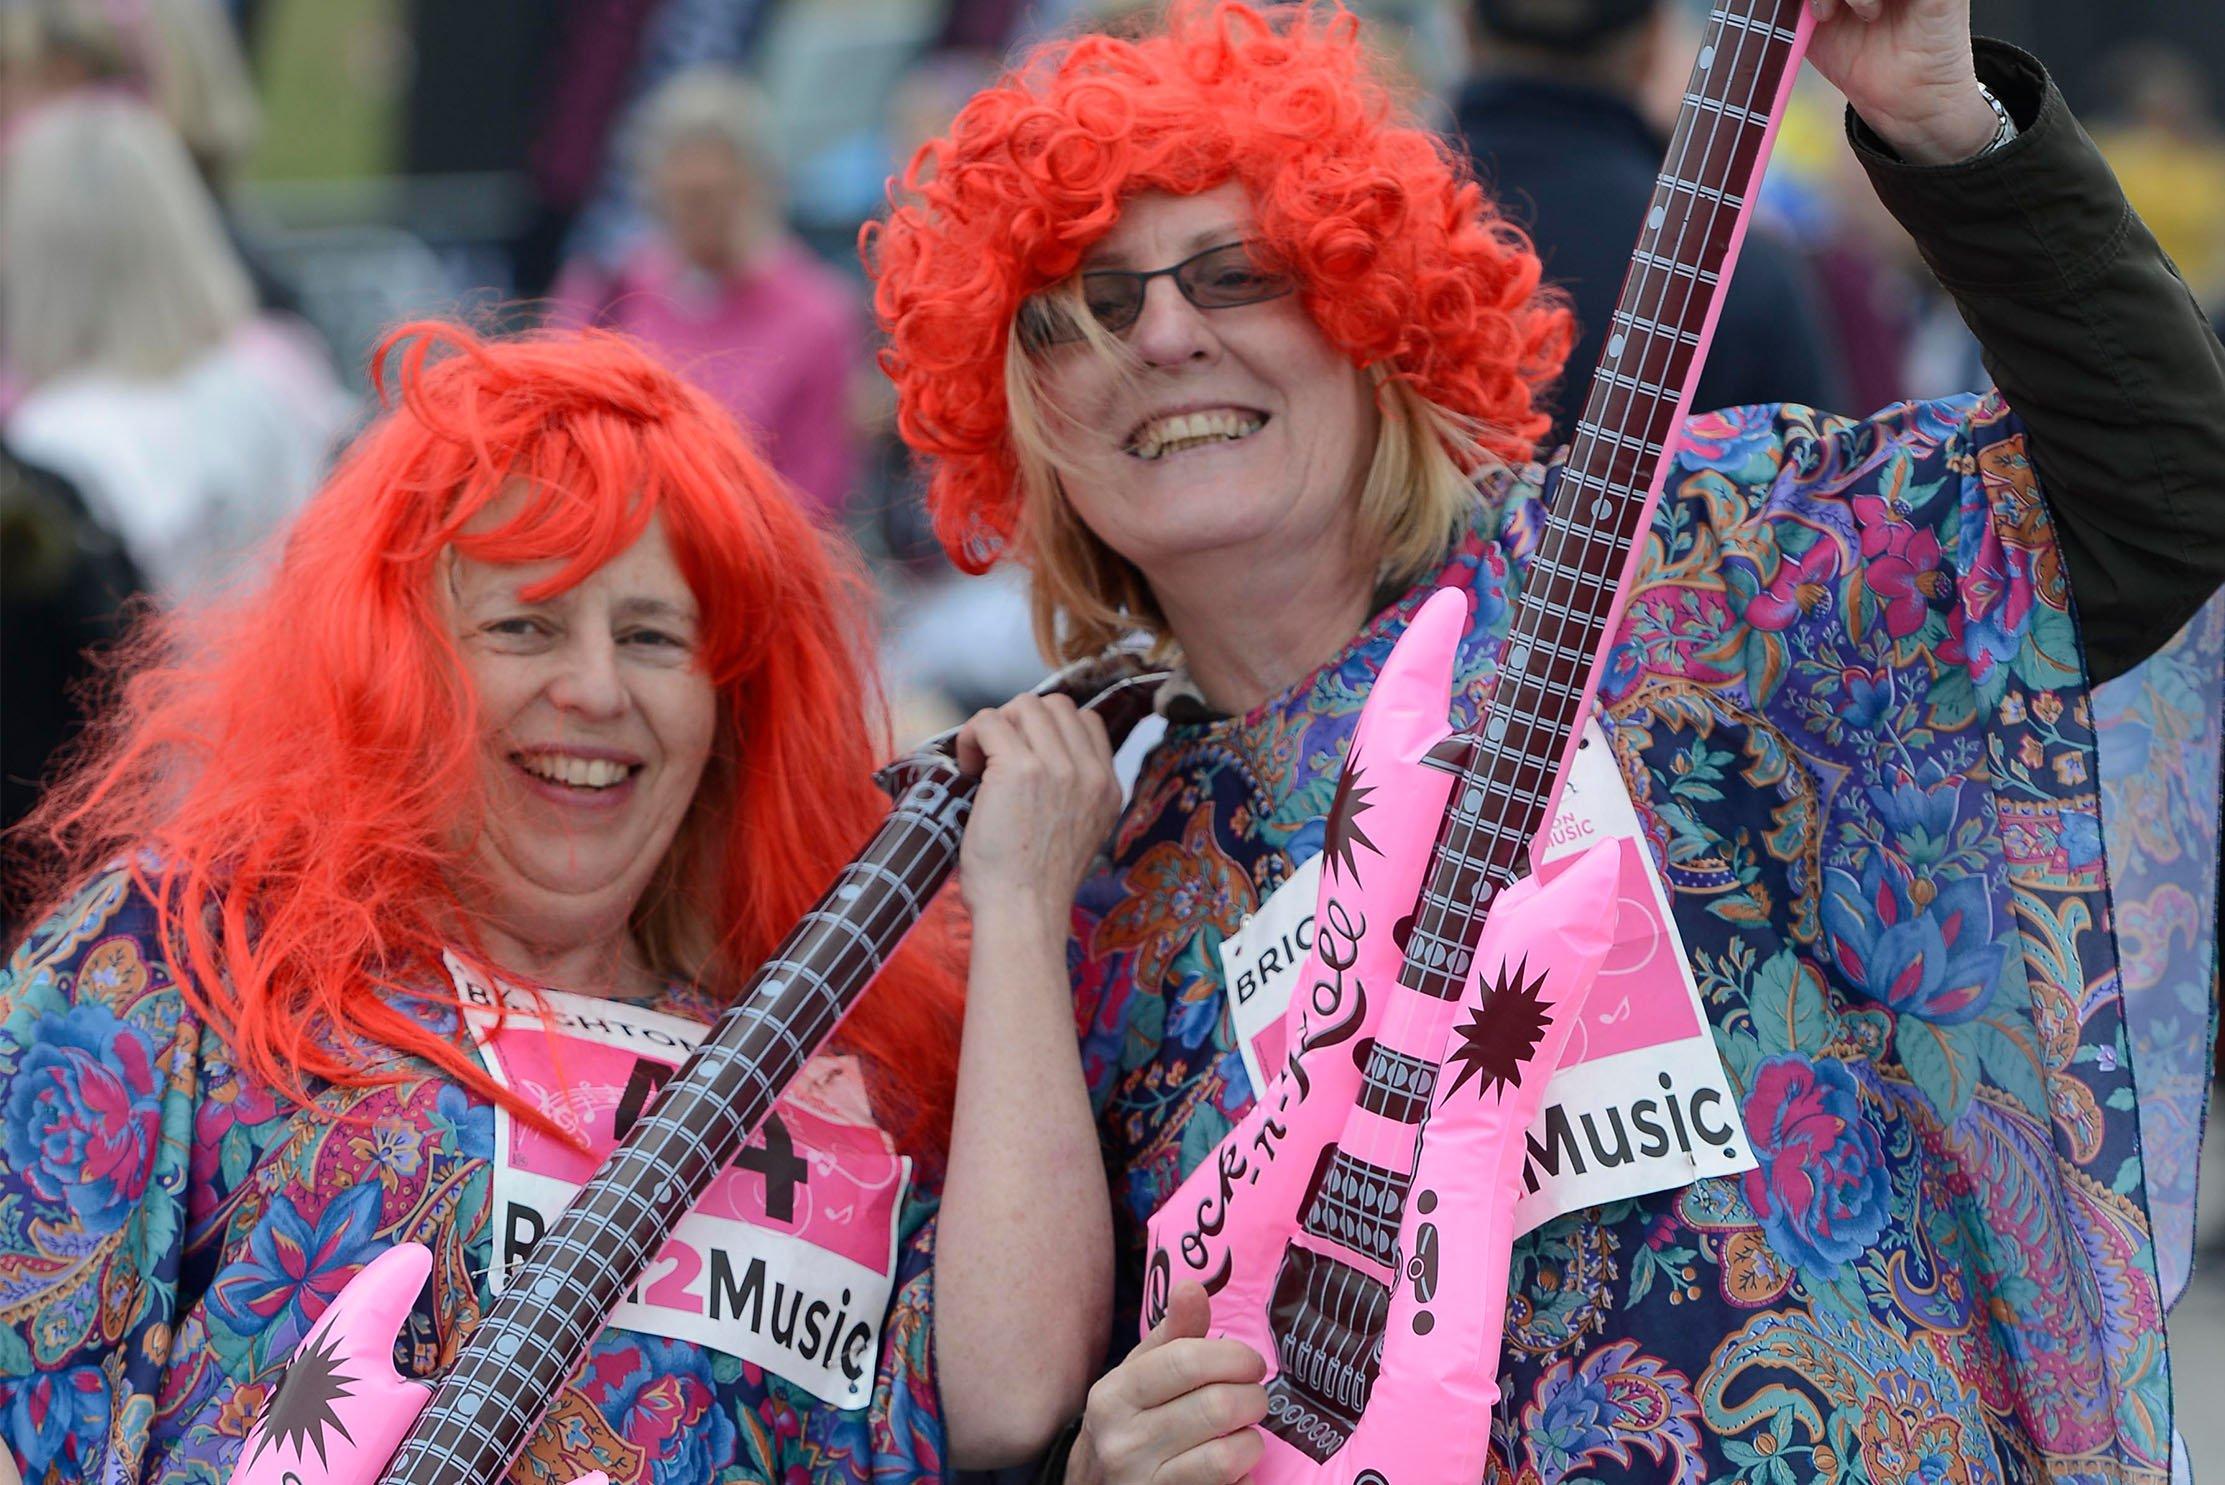 Brighton Run2Music has rescheduled it's event to Sat 17 Oct 2020